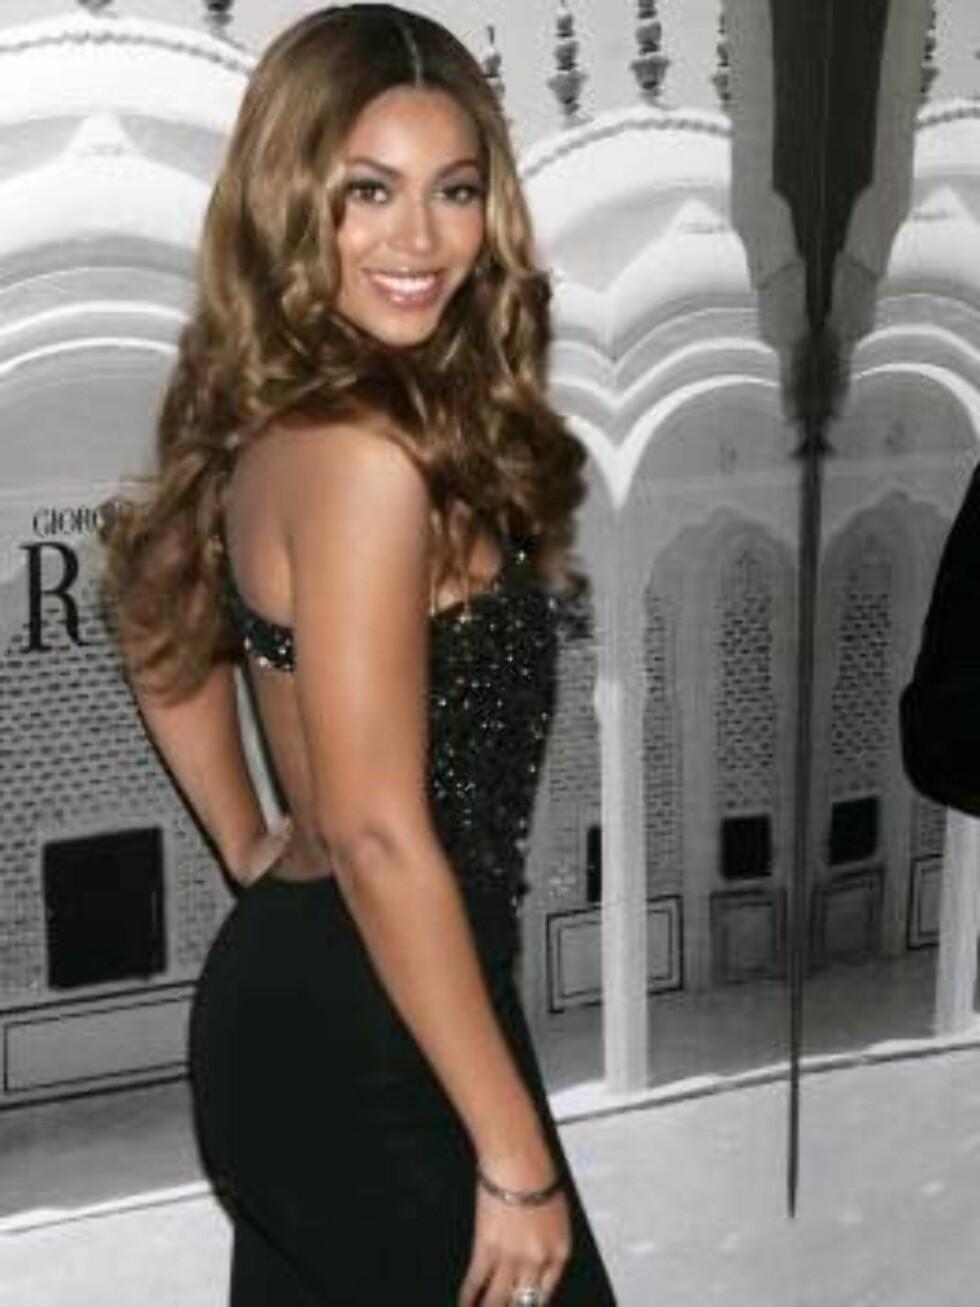 NUMMER FIRE: Beyoncé Knowles Foto: SCANPIX